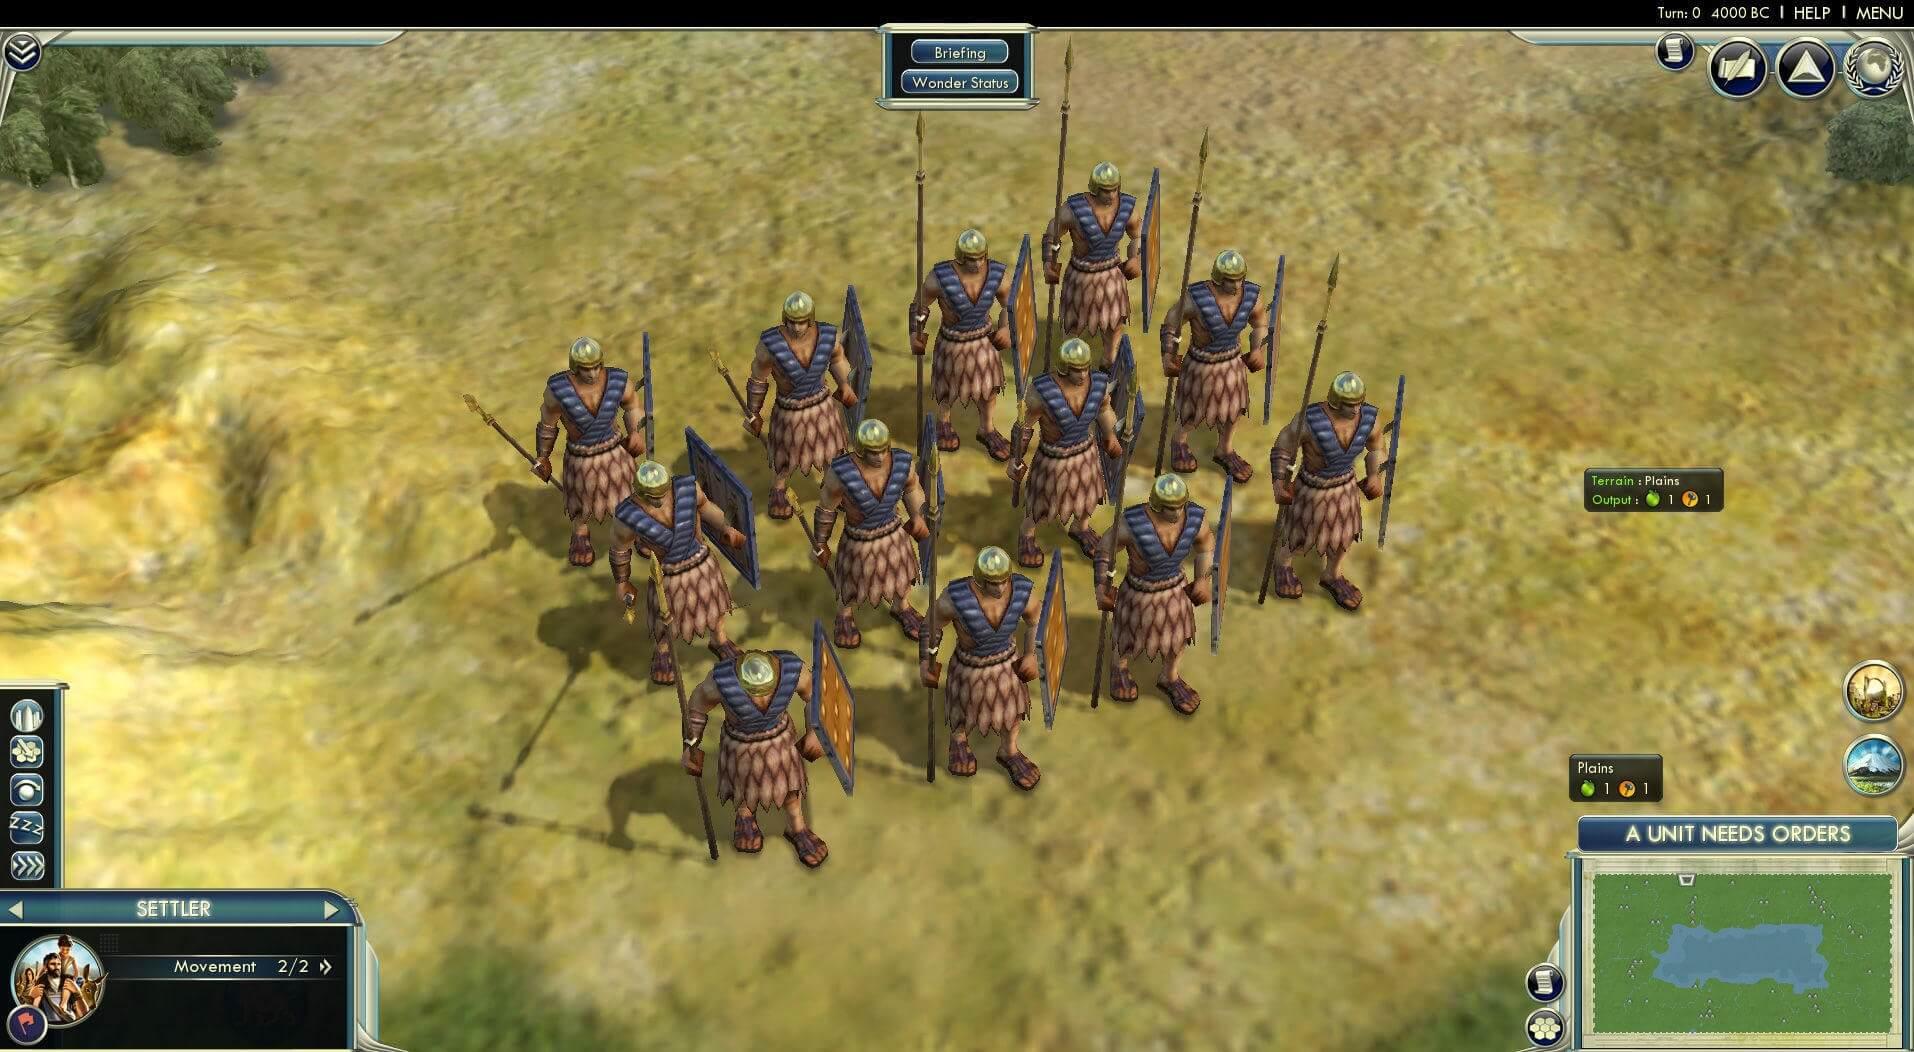 Sid Meier's Civilization V Wonders of the Ancient World Scenario Pack (WW)